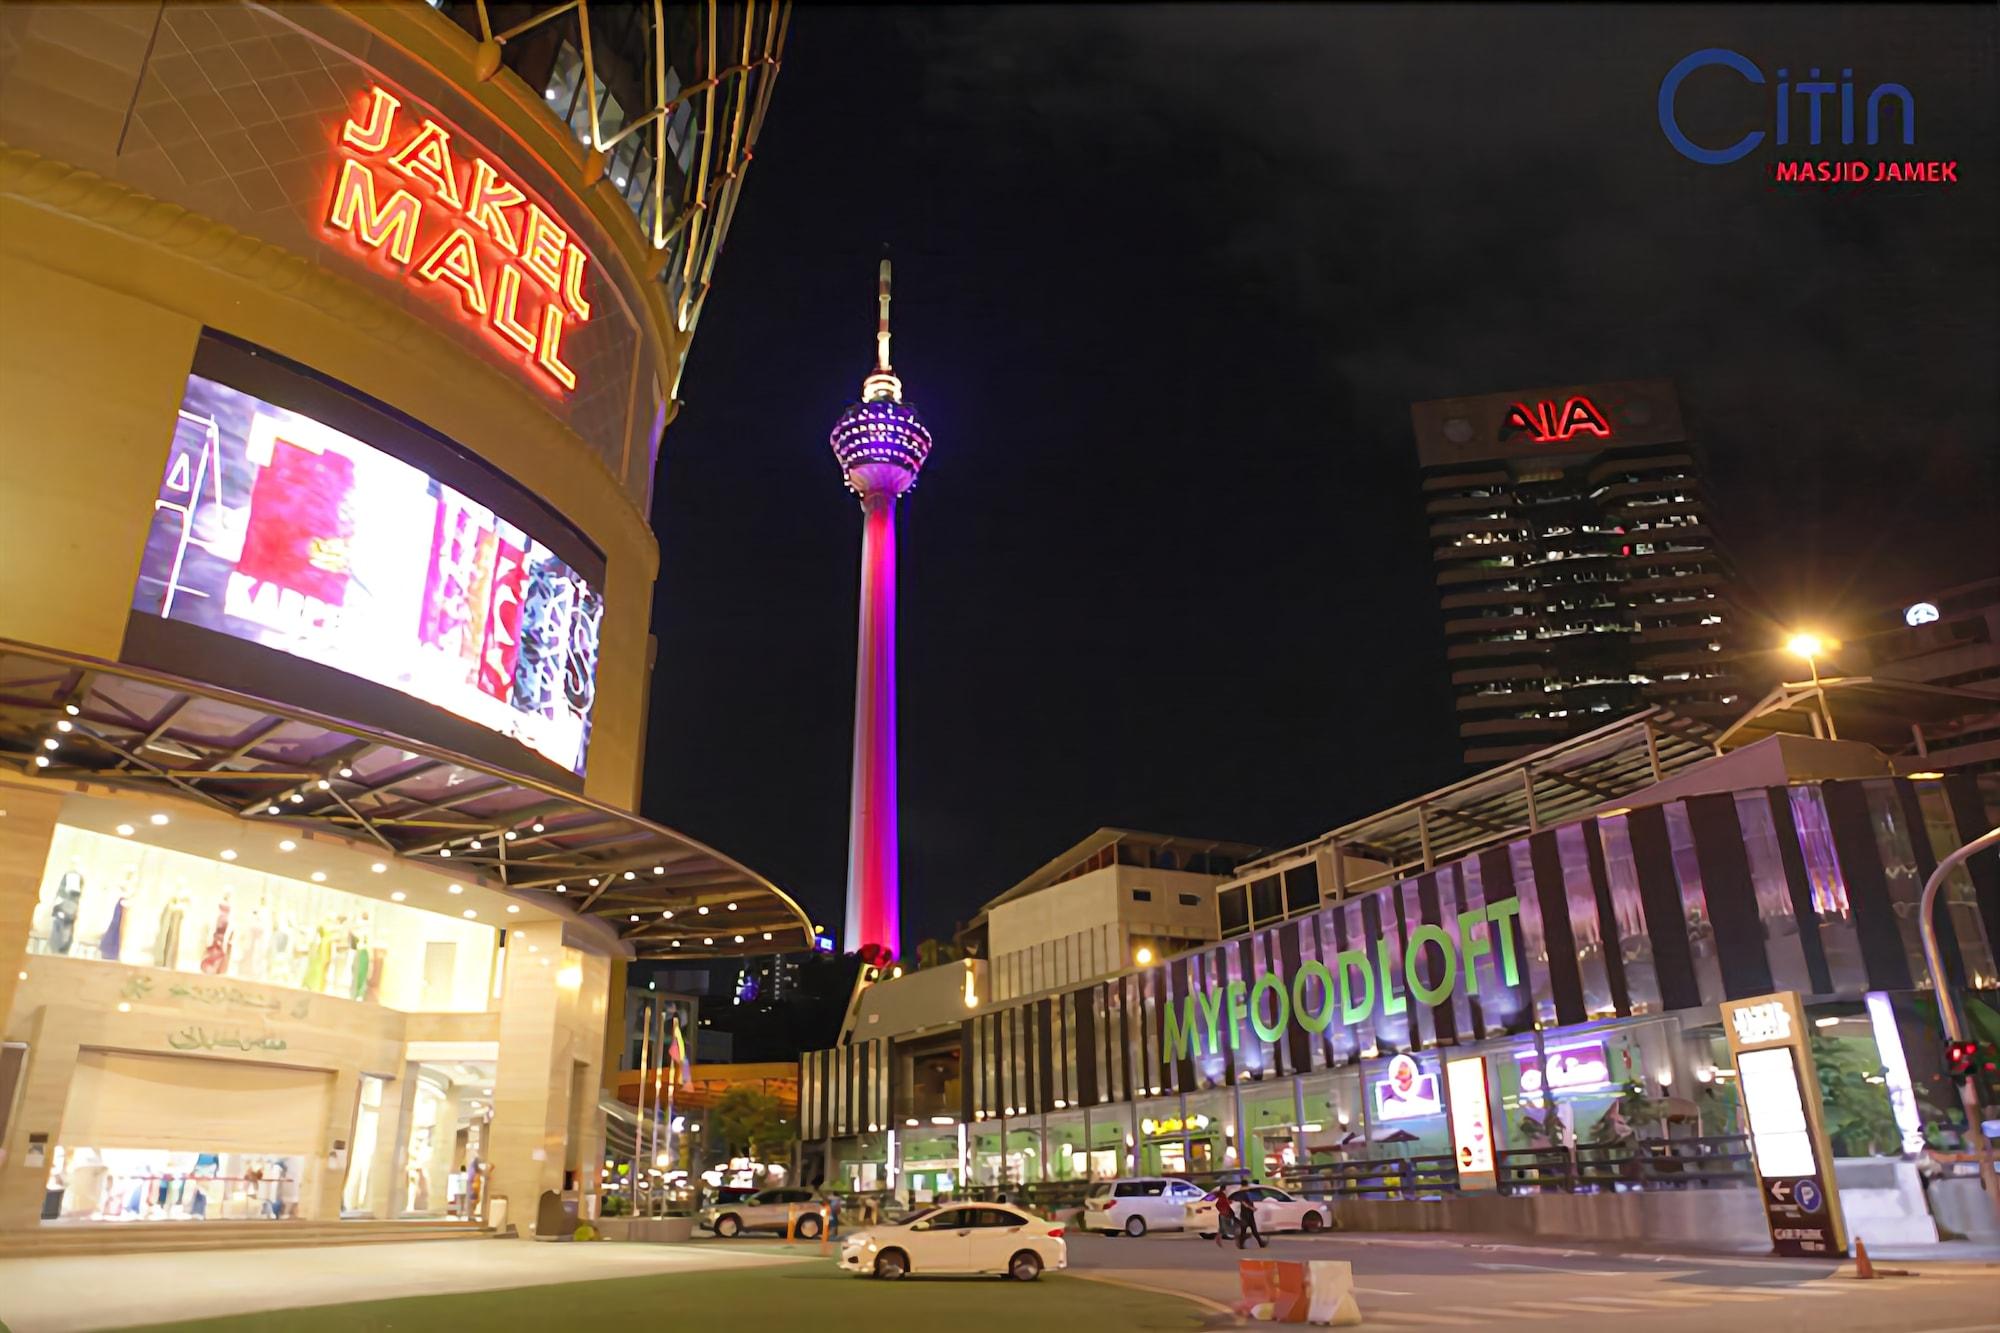 Citin Hotel Masjid Jamek by Compass Hospitality, Kuala Lumpur